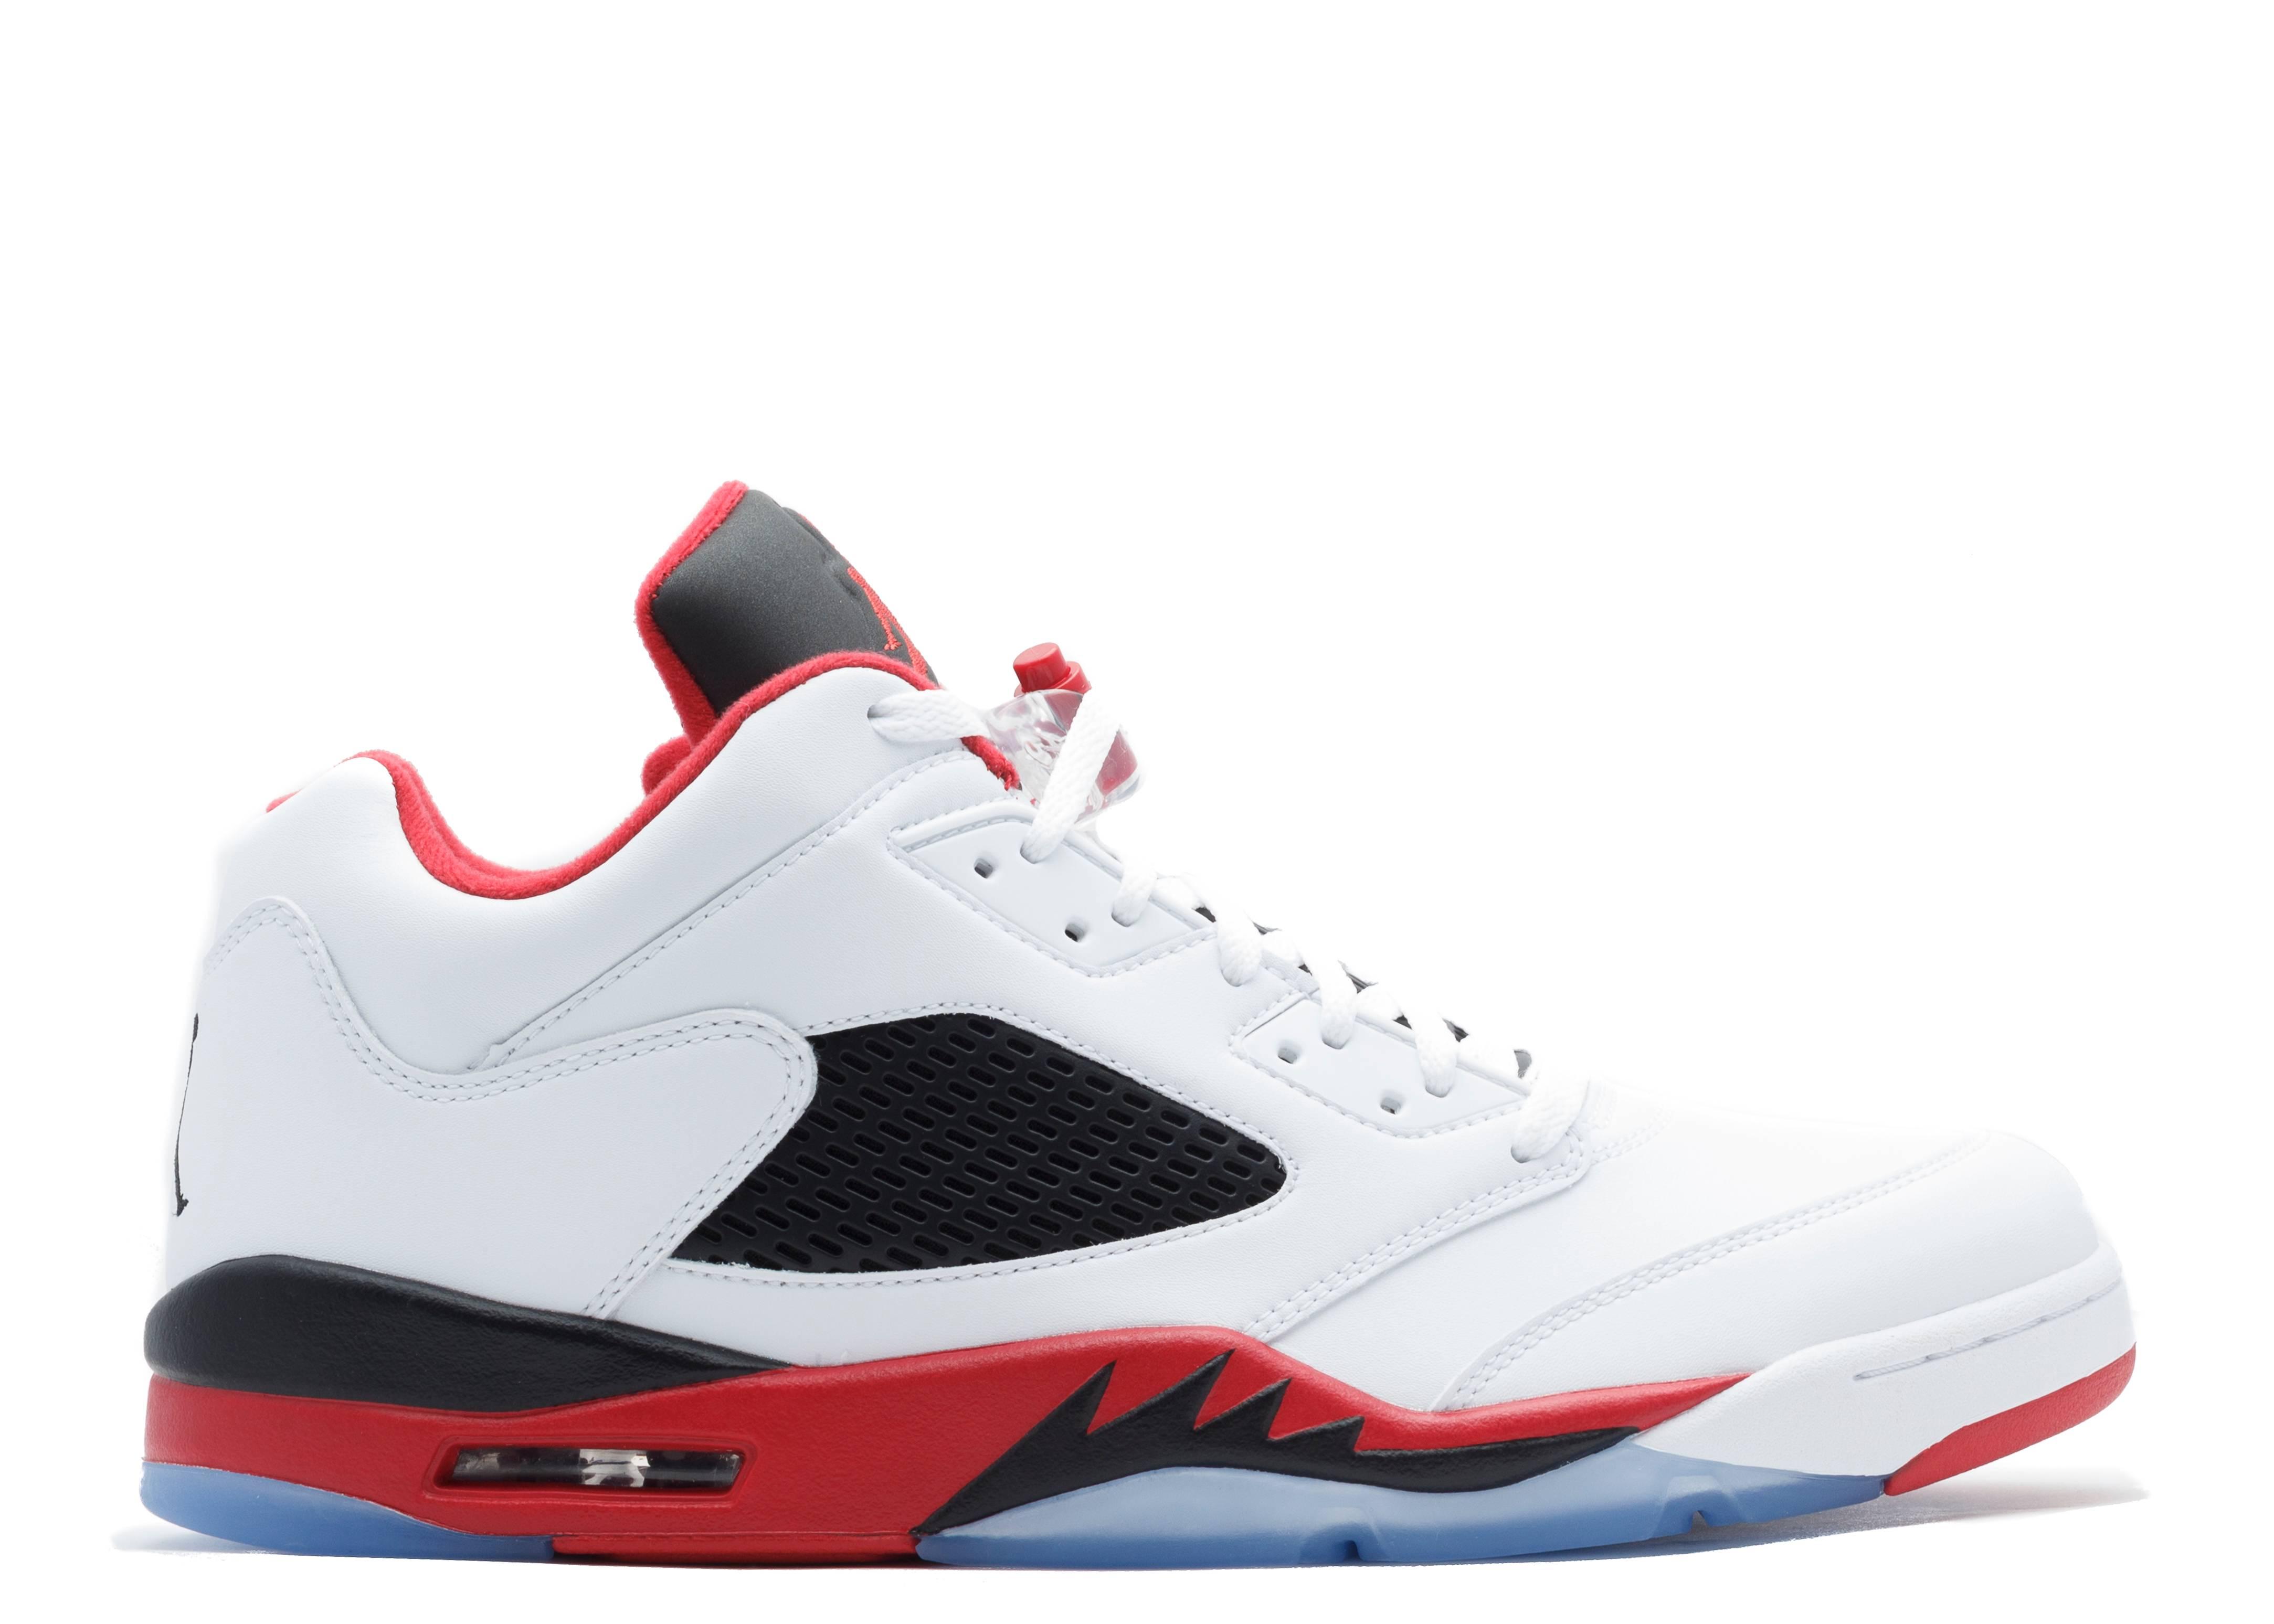 6b58af025cc7d9 Air Jordan 5 Retro Low - Air Jordan - 819171 101 - white fire red-black